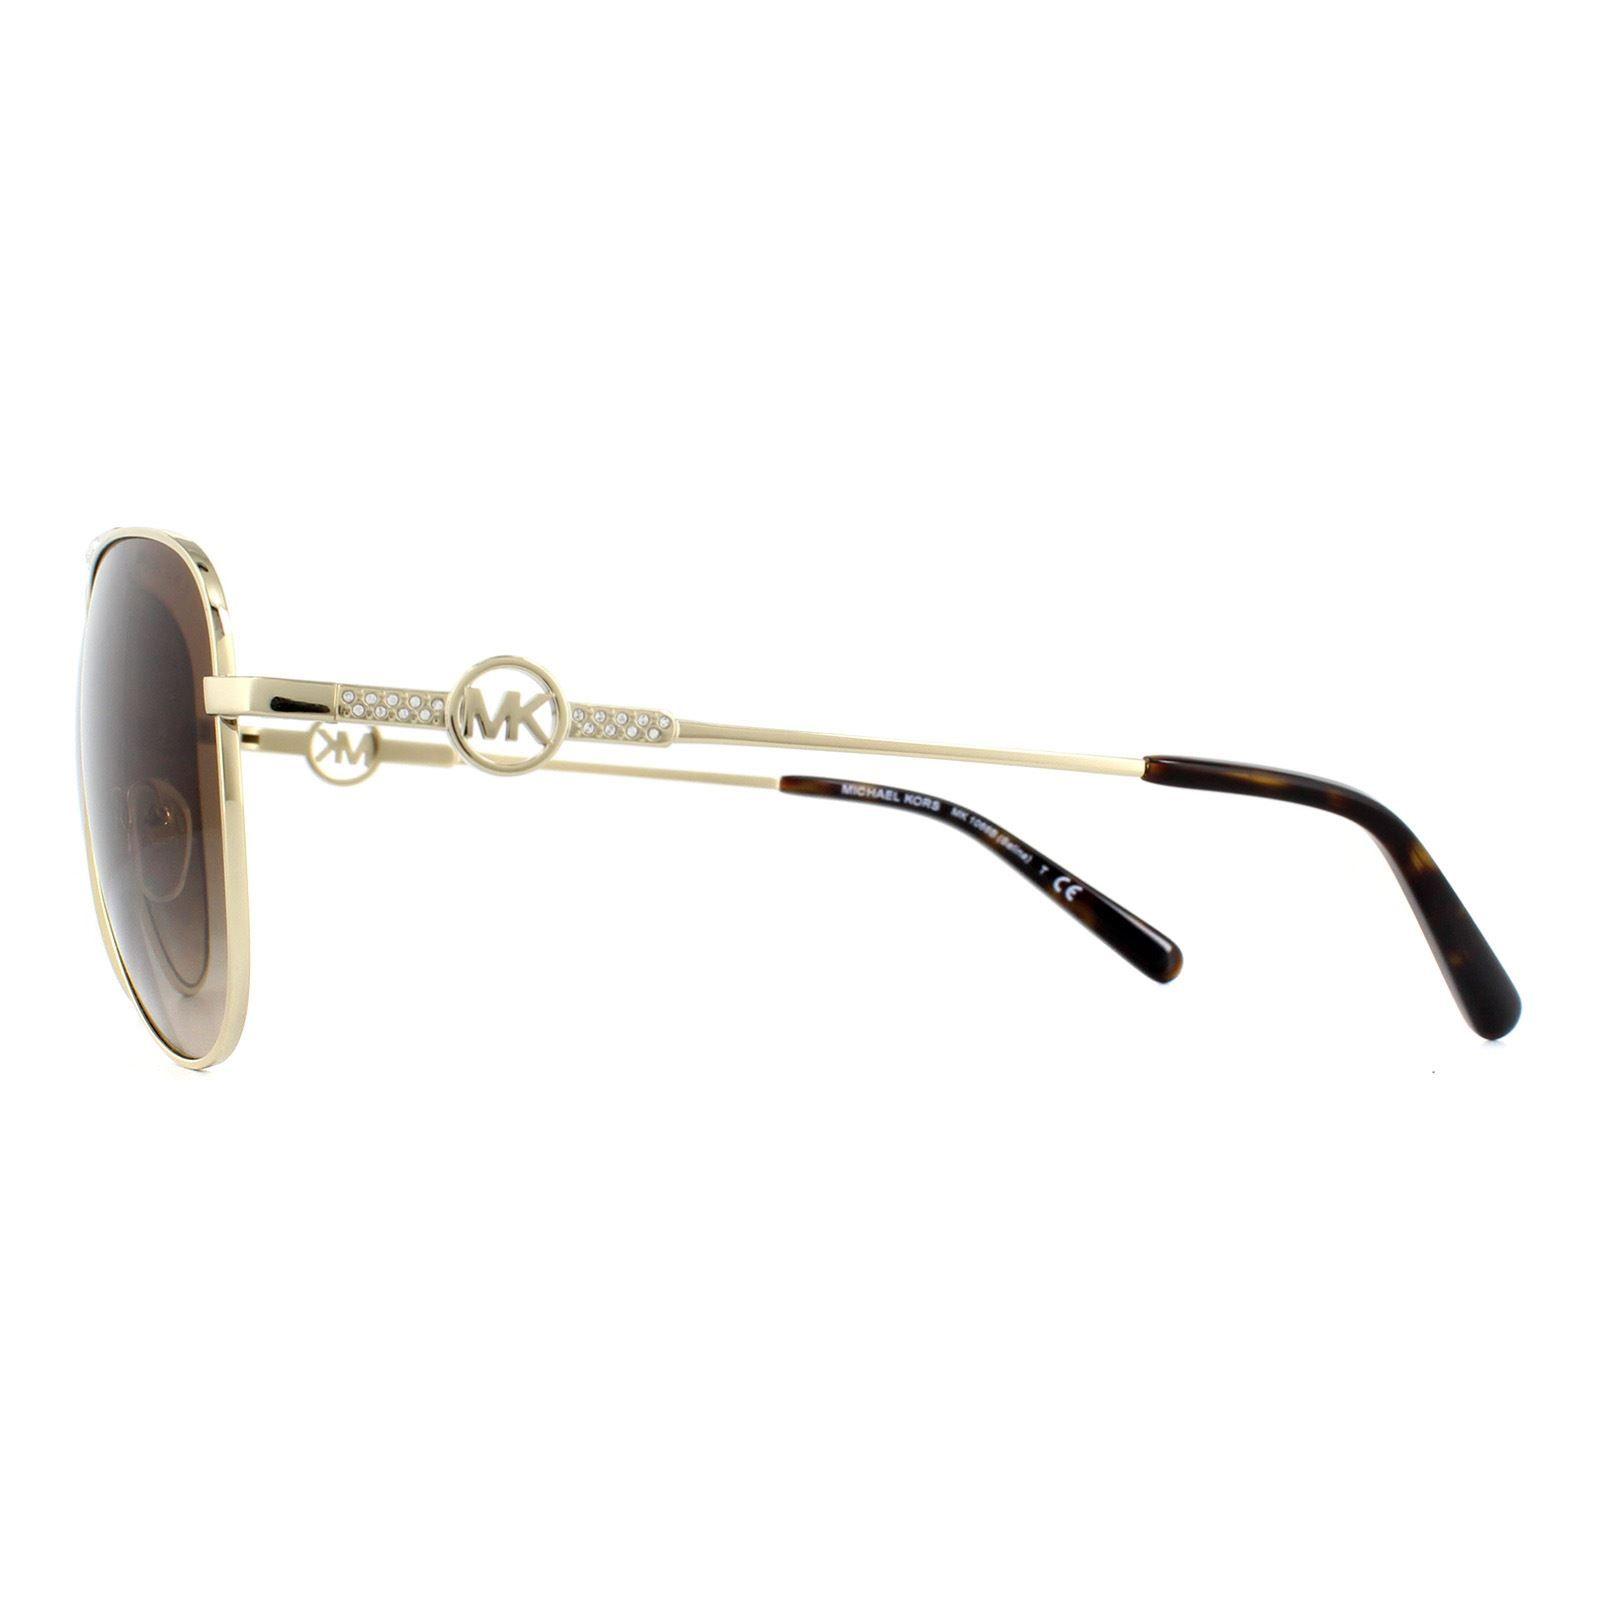 Michael Kors Sunglasses MK1066B Salina 100113 Light Gold Brown Gradient